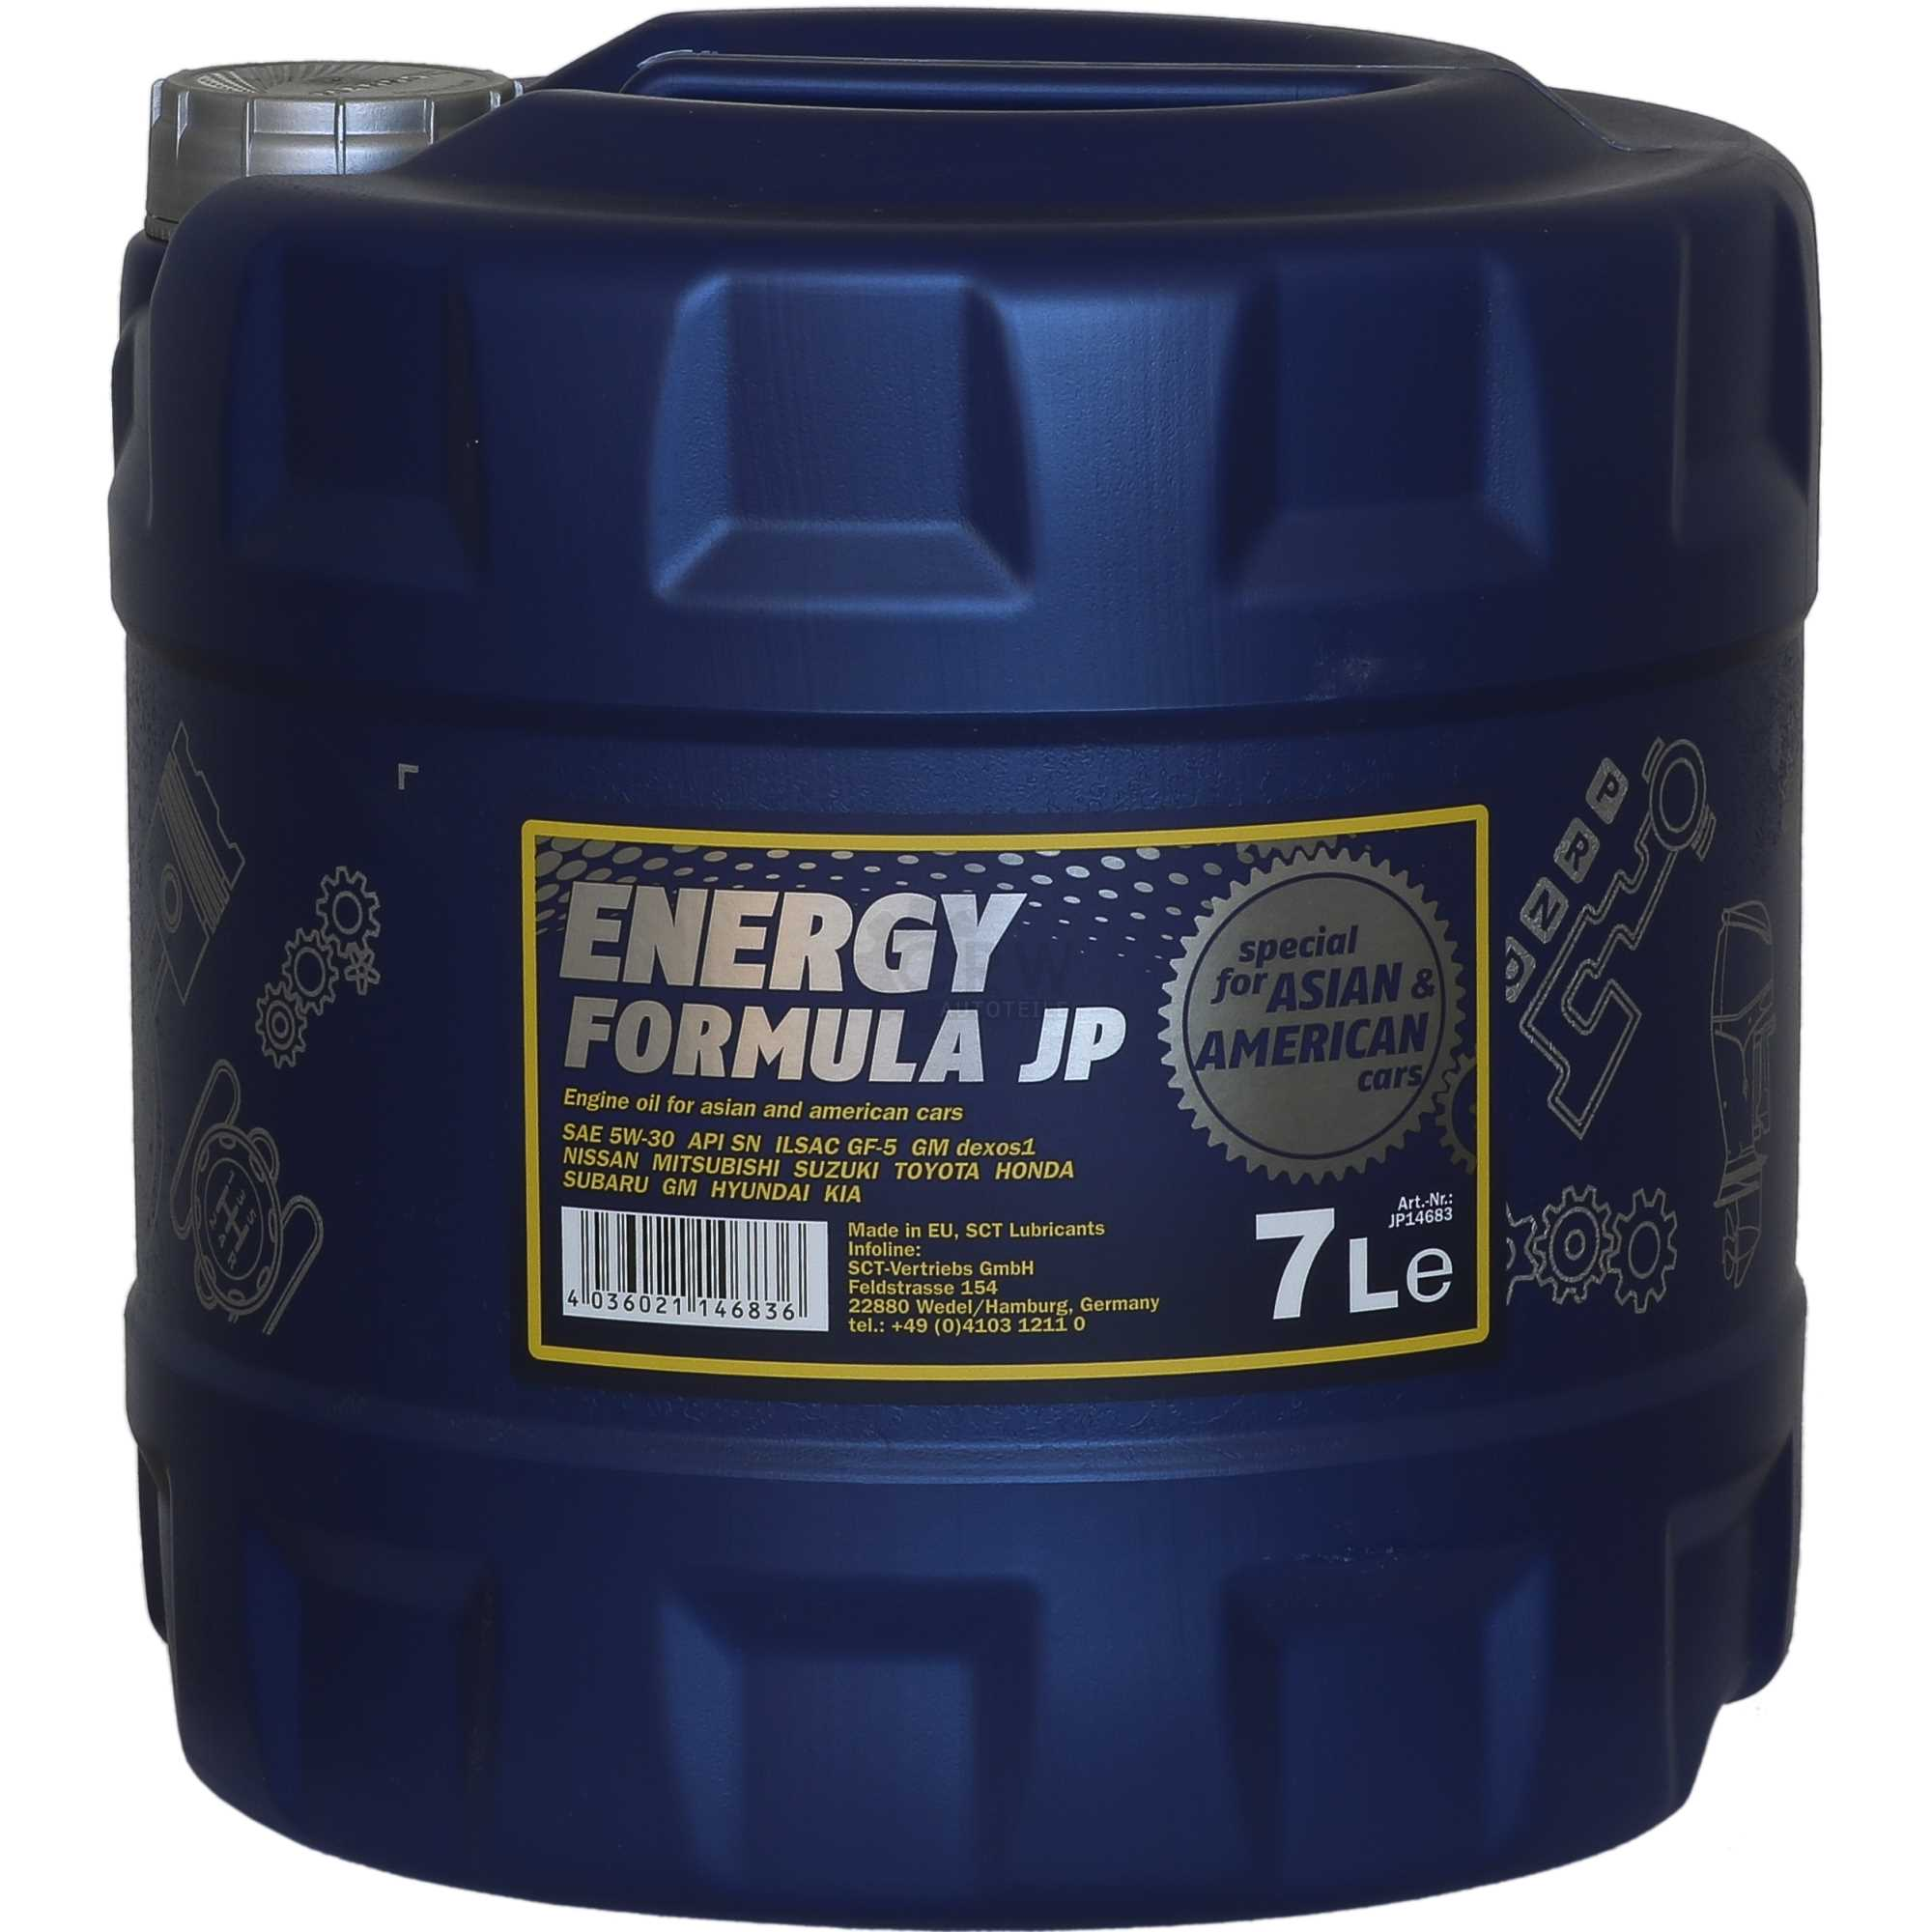 Aceite-del-motor-aceite-5w40-10w40-15w40-5w30-10w60-1l-4l-5l-7l-10l-20l miniatura 46